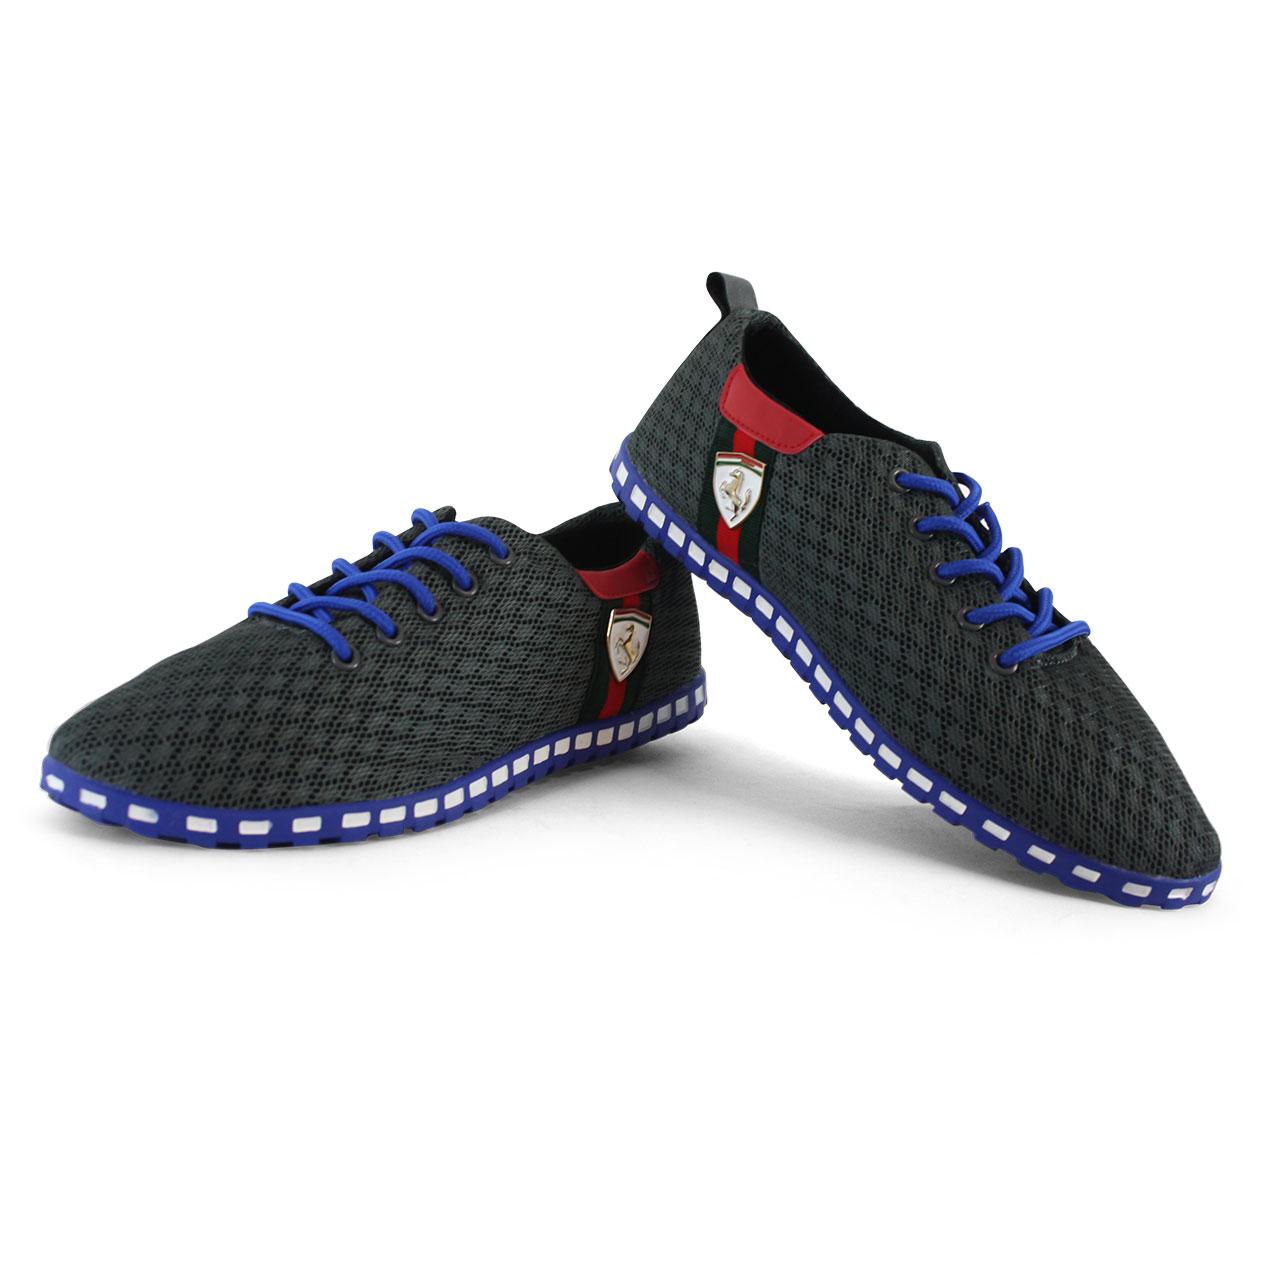 Men's Athletic Comfort PU Tulle Unicorn Gray Shoes